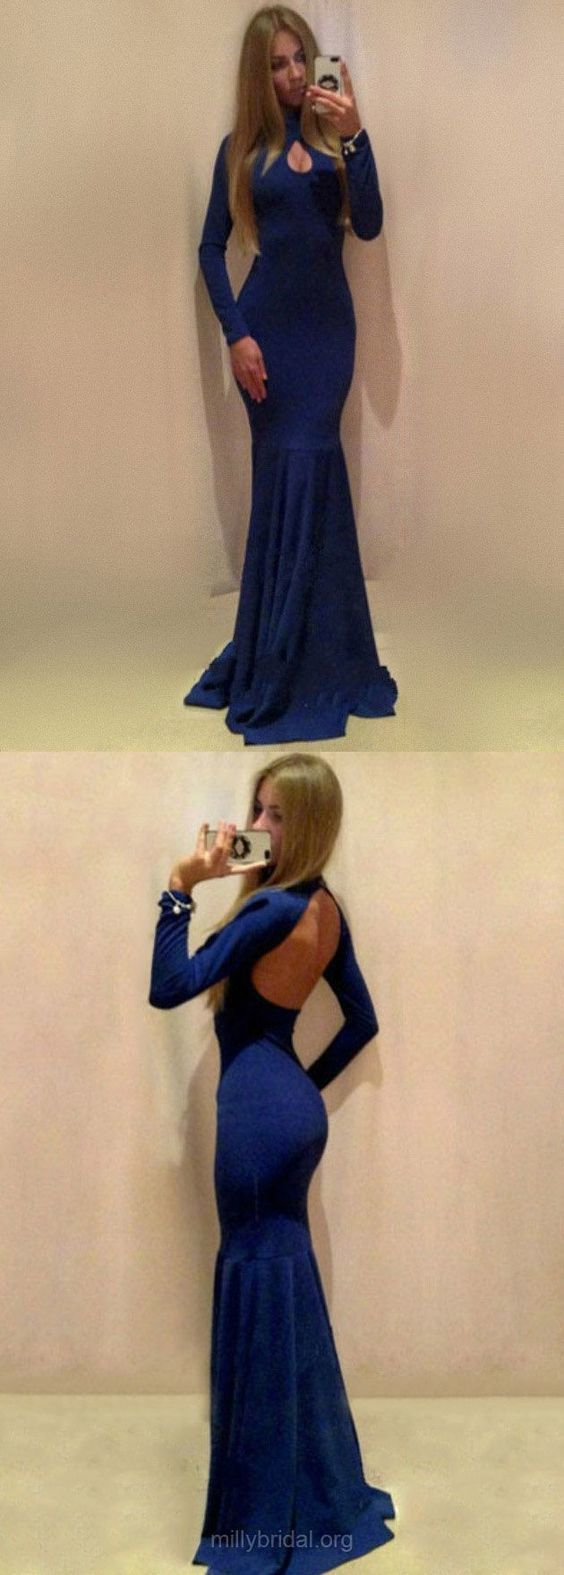 Blue prom dresses long prom dresses long sleeve prom dresses for